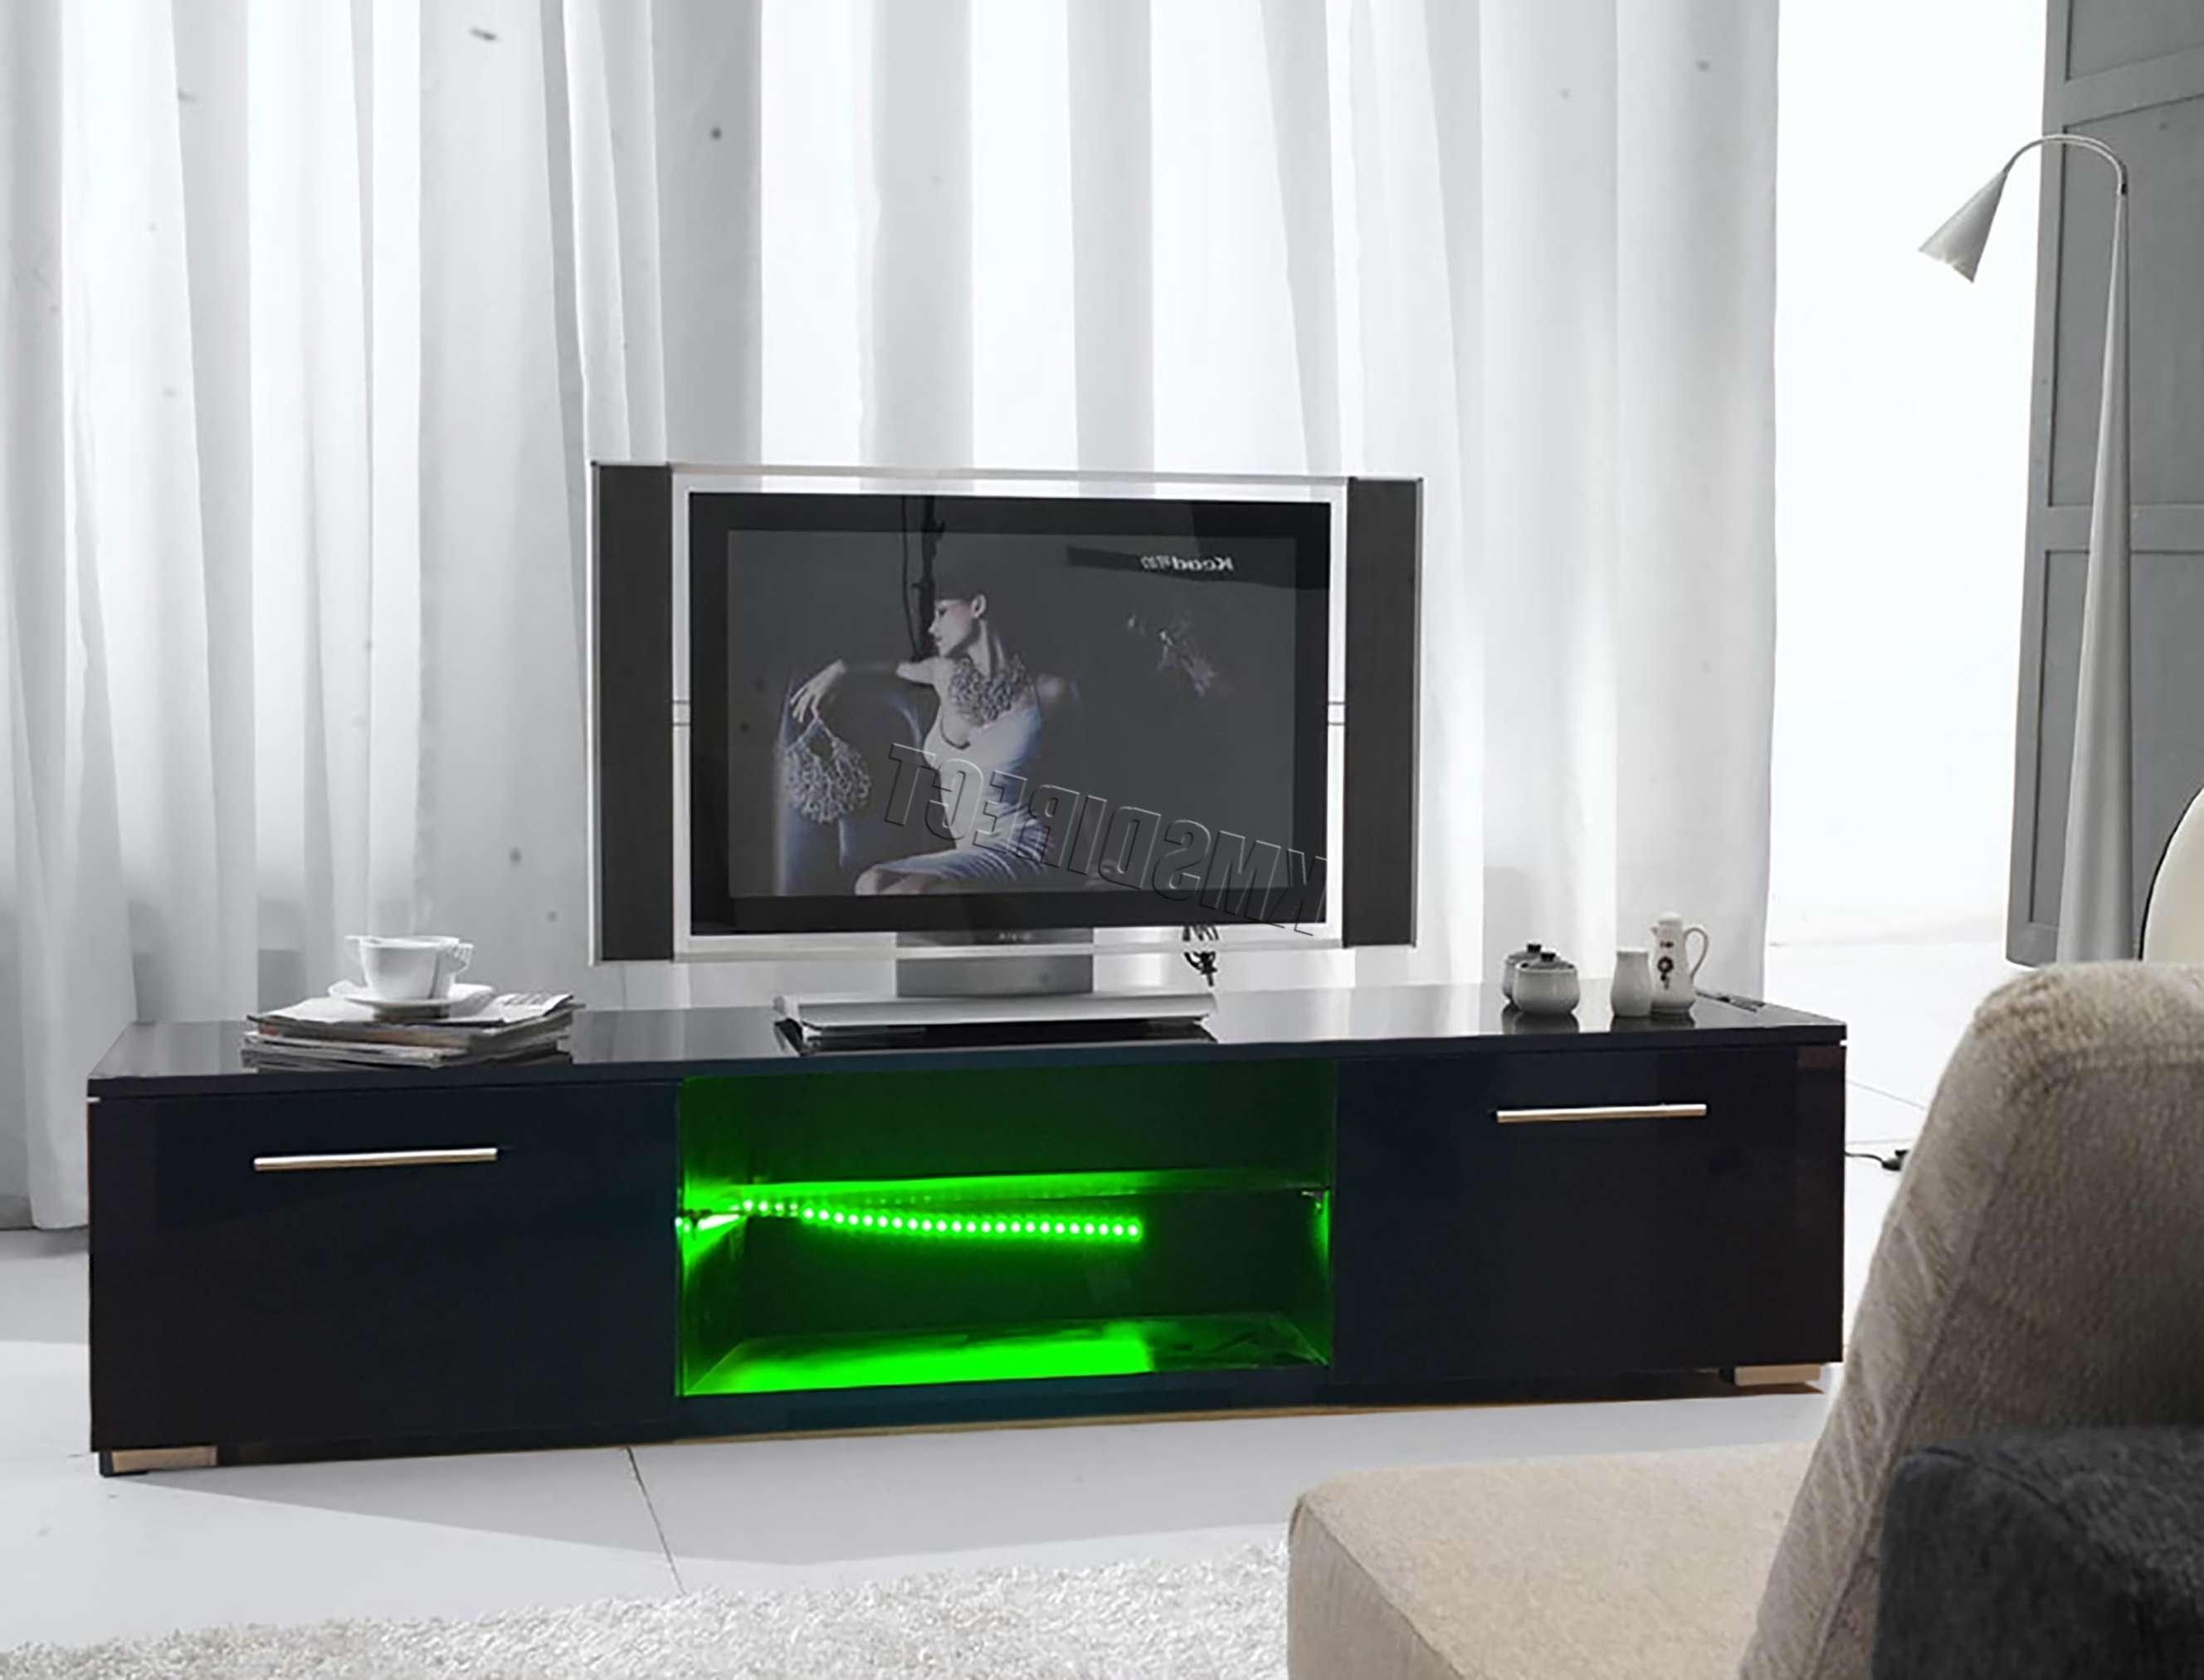 Foxhunter Modern High Gloss Matt Tv Cabinet Unit Stand Black Rgb Inside Led Tv Cabinets (View 2 of 20)